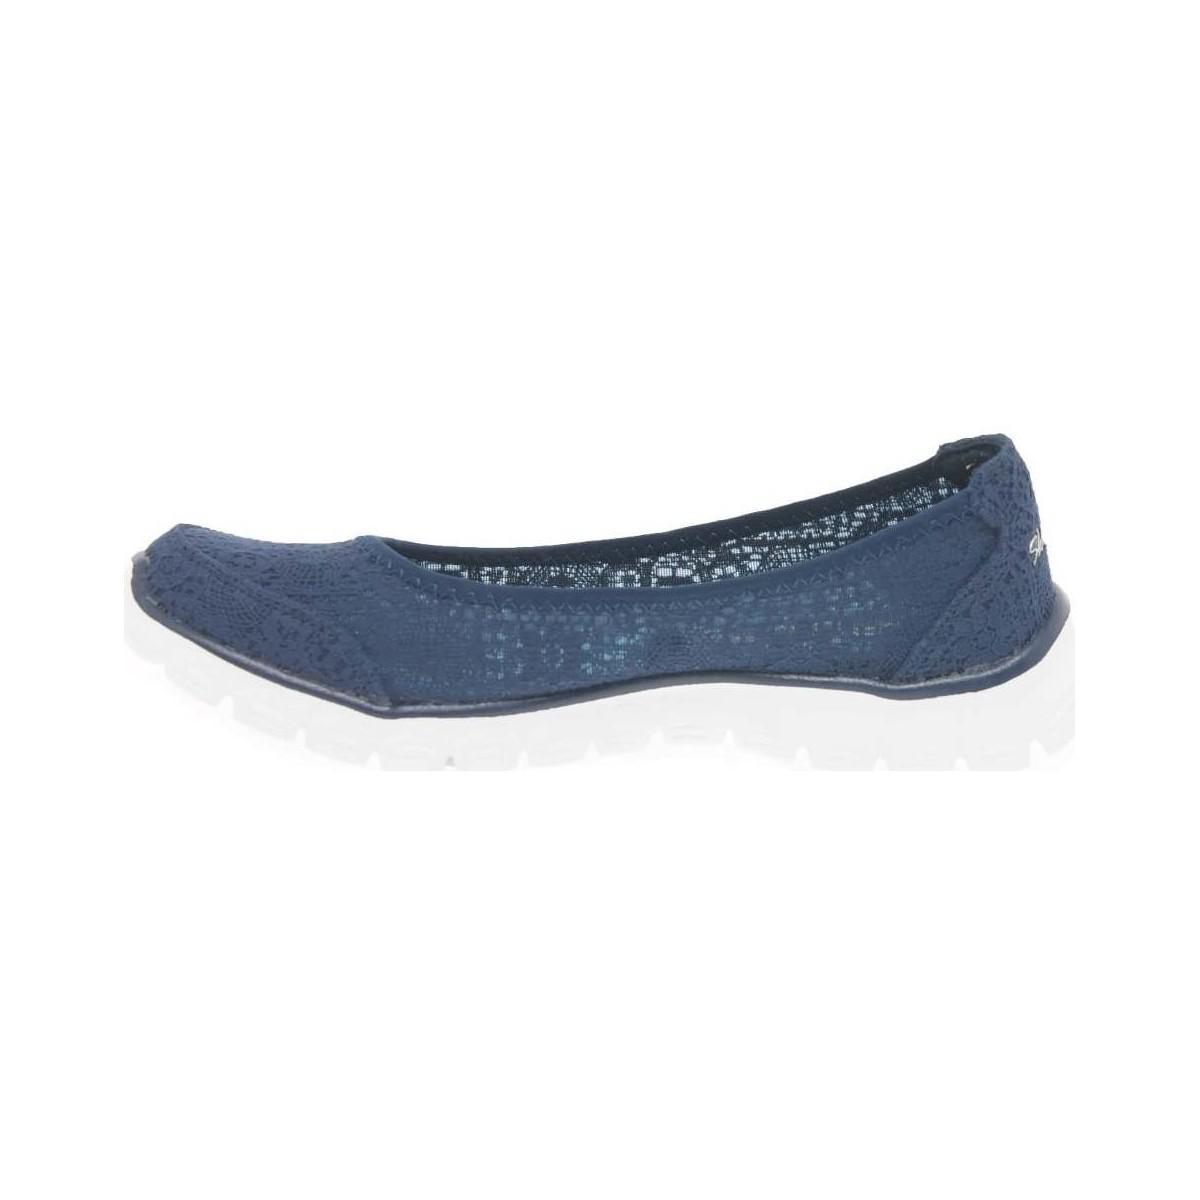 Skechers Ez Flex 3.0 Beautify Womens Slip On Sports Shoes Women's Shoes (trainers) In Blue